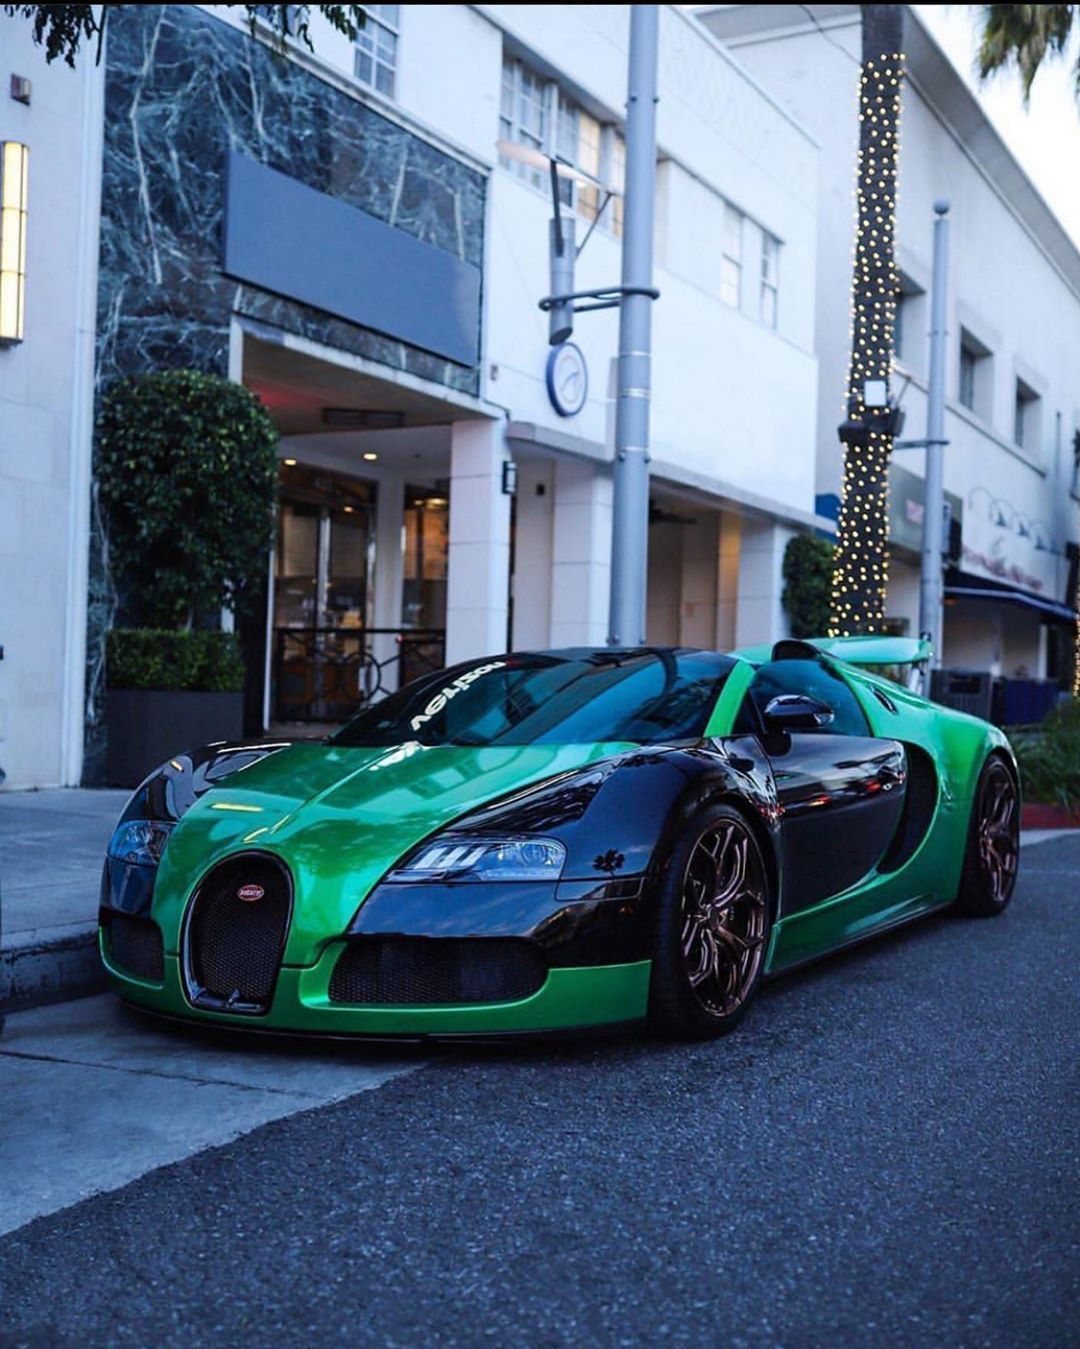 Bugatti Veyron Green: Pin On Luxury Car Lifestyle